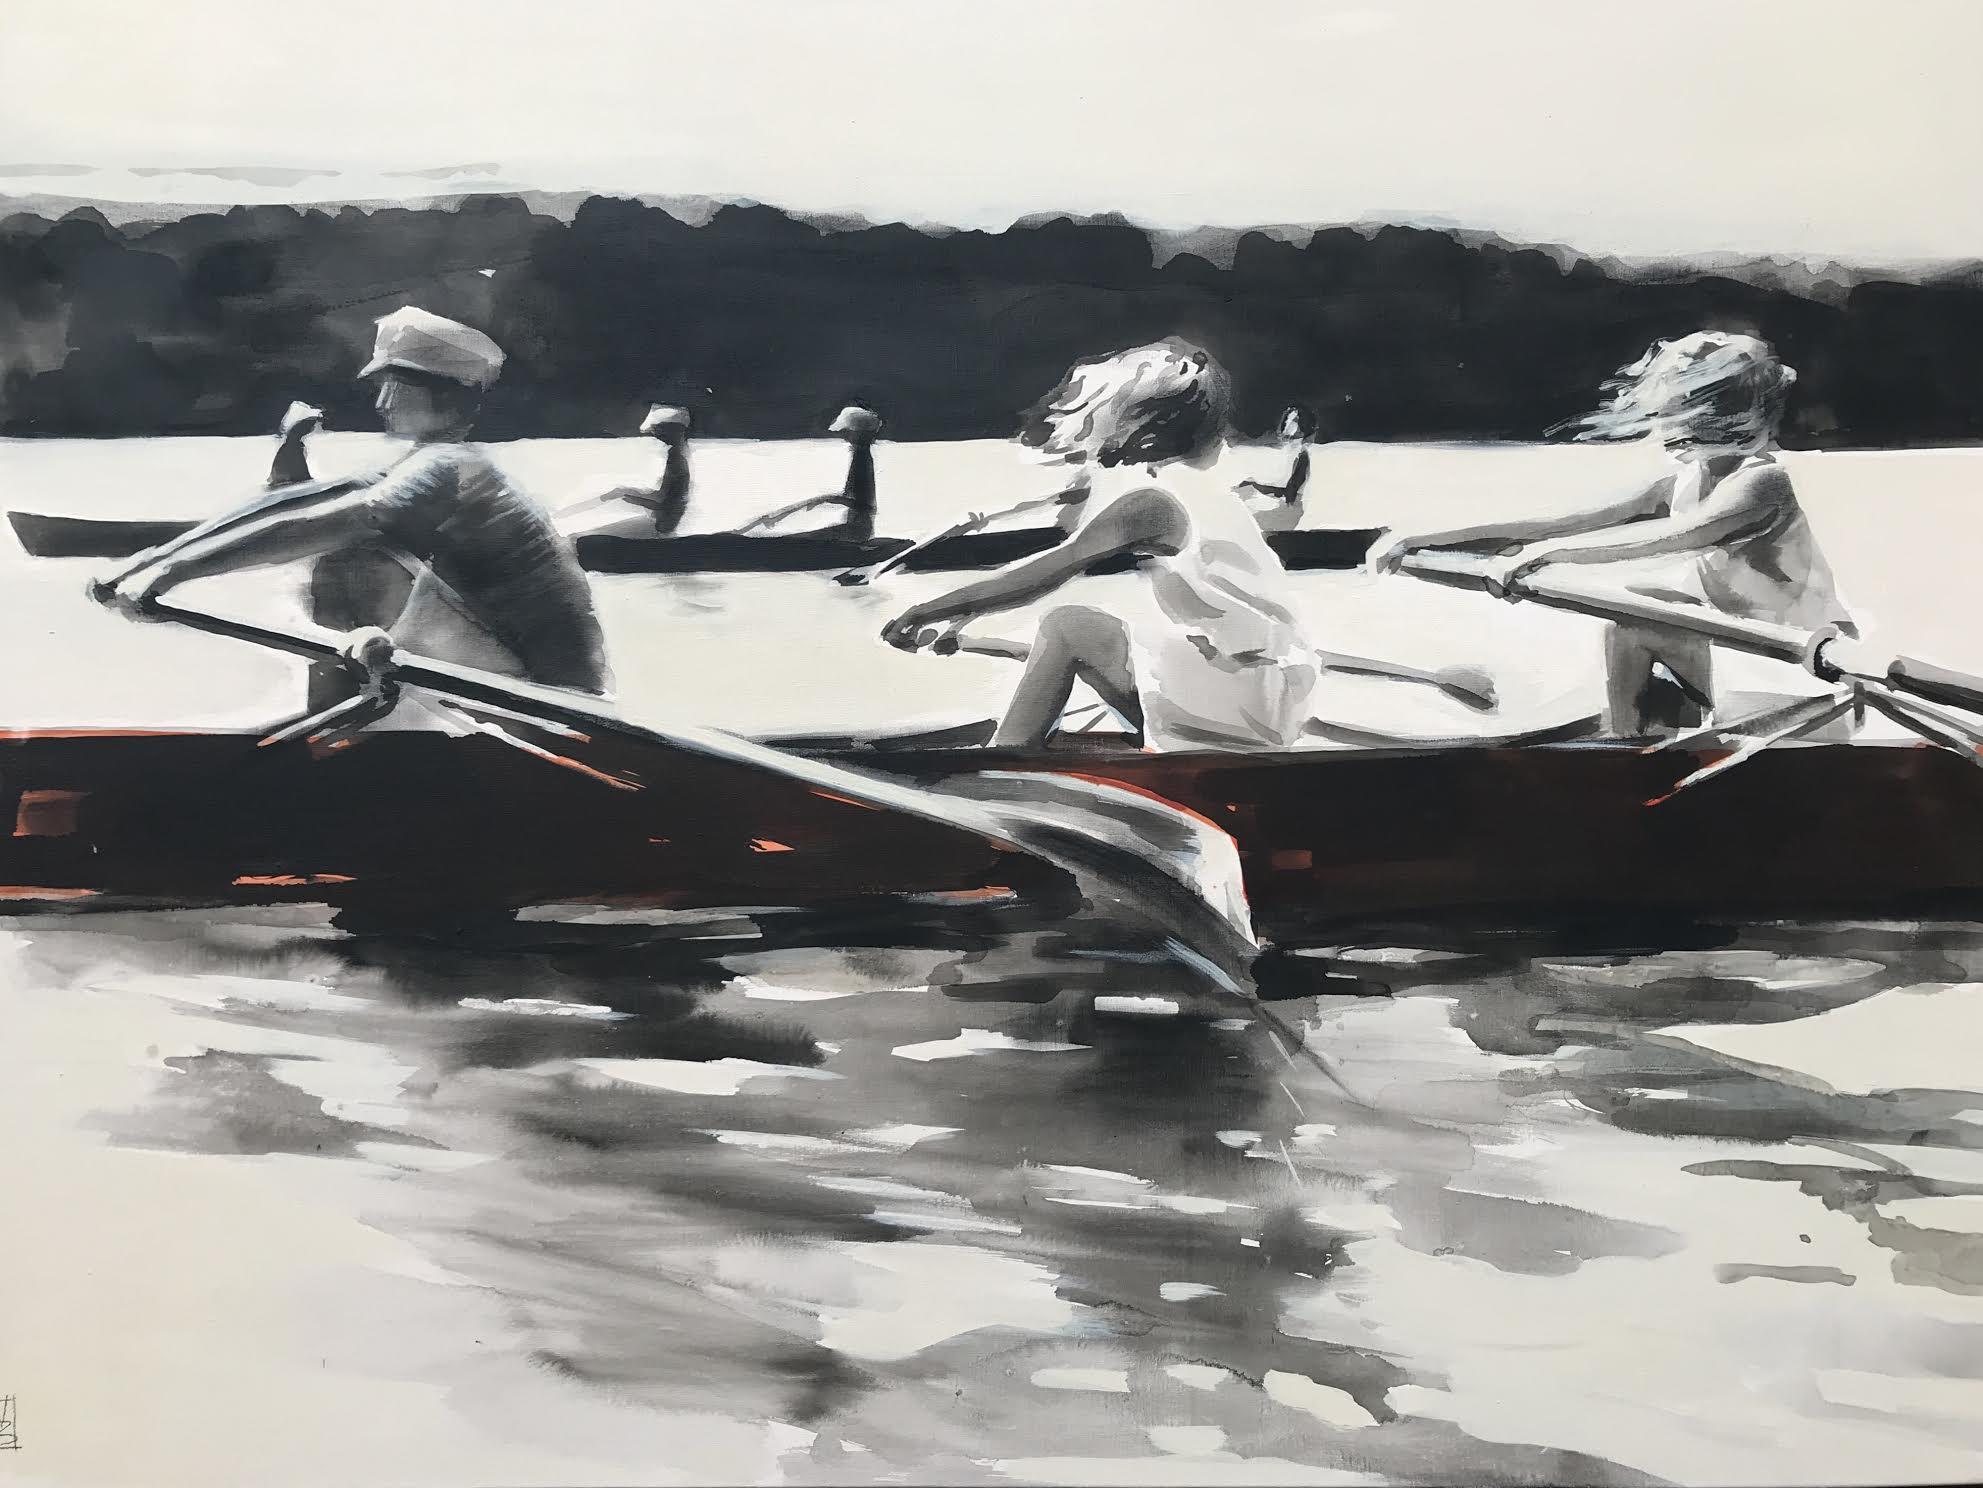 La course d'aviron Peinture